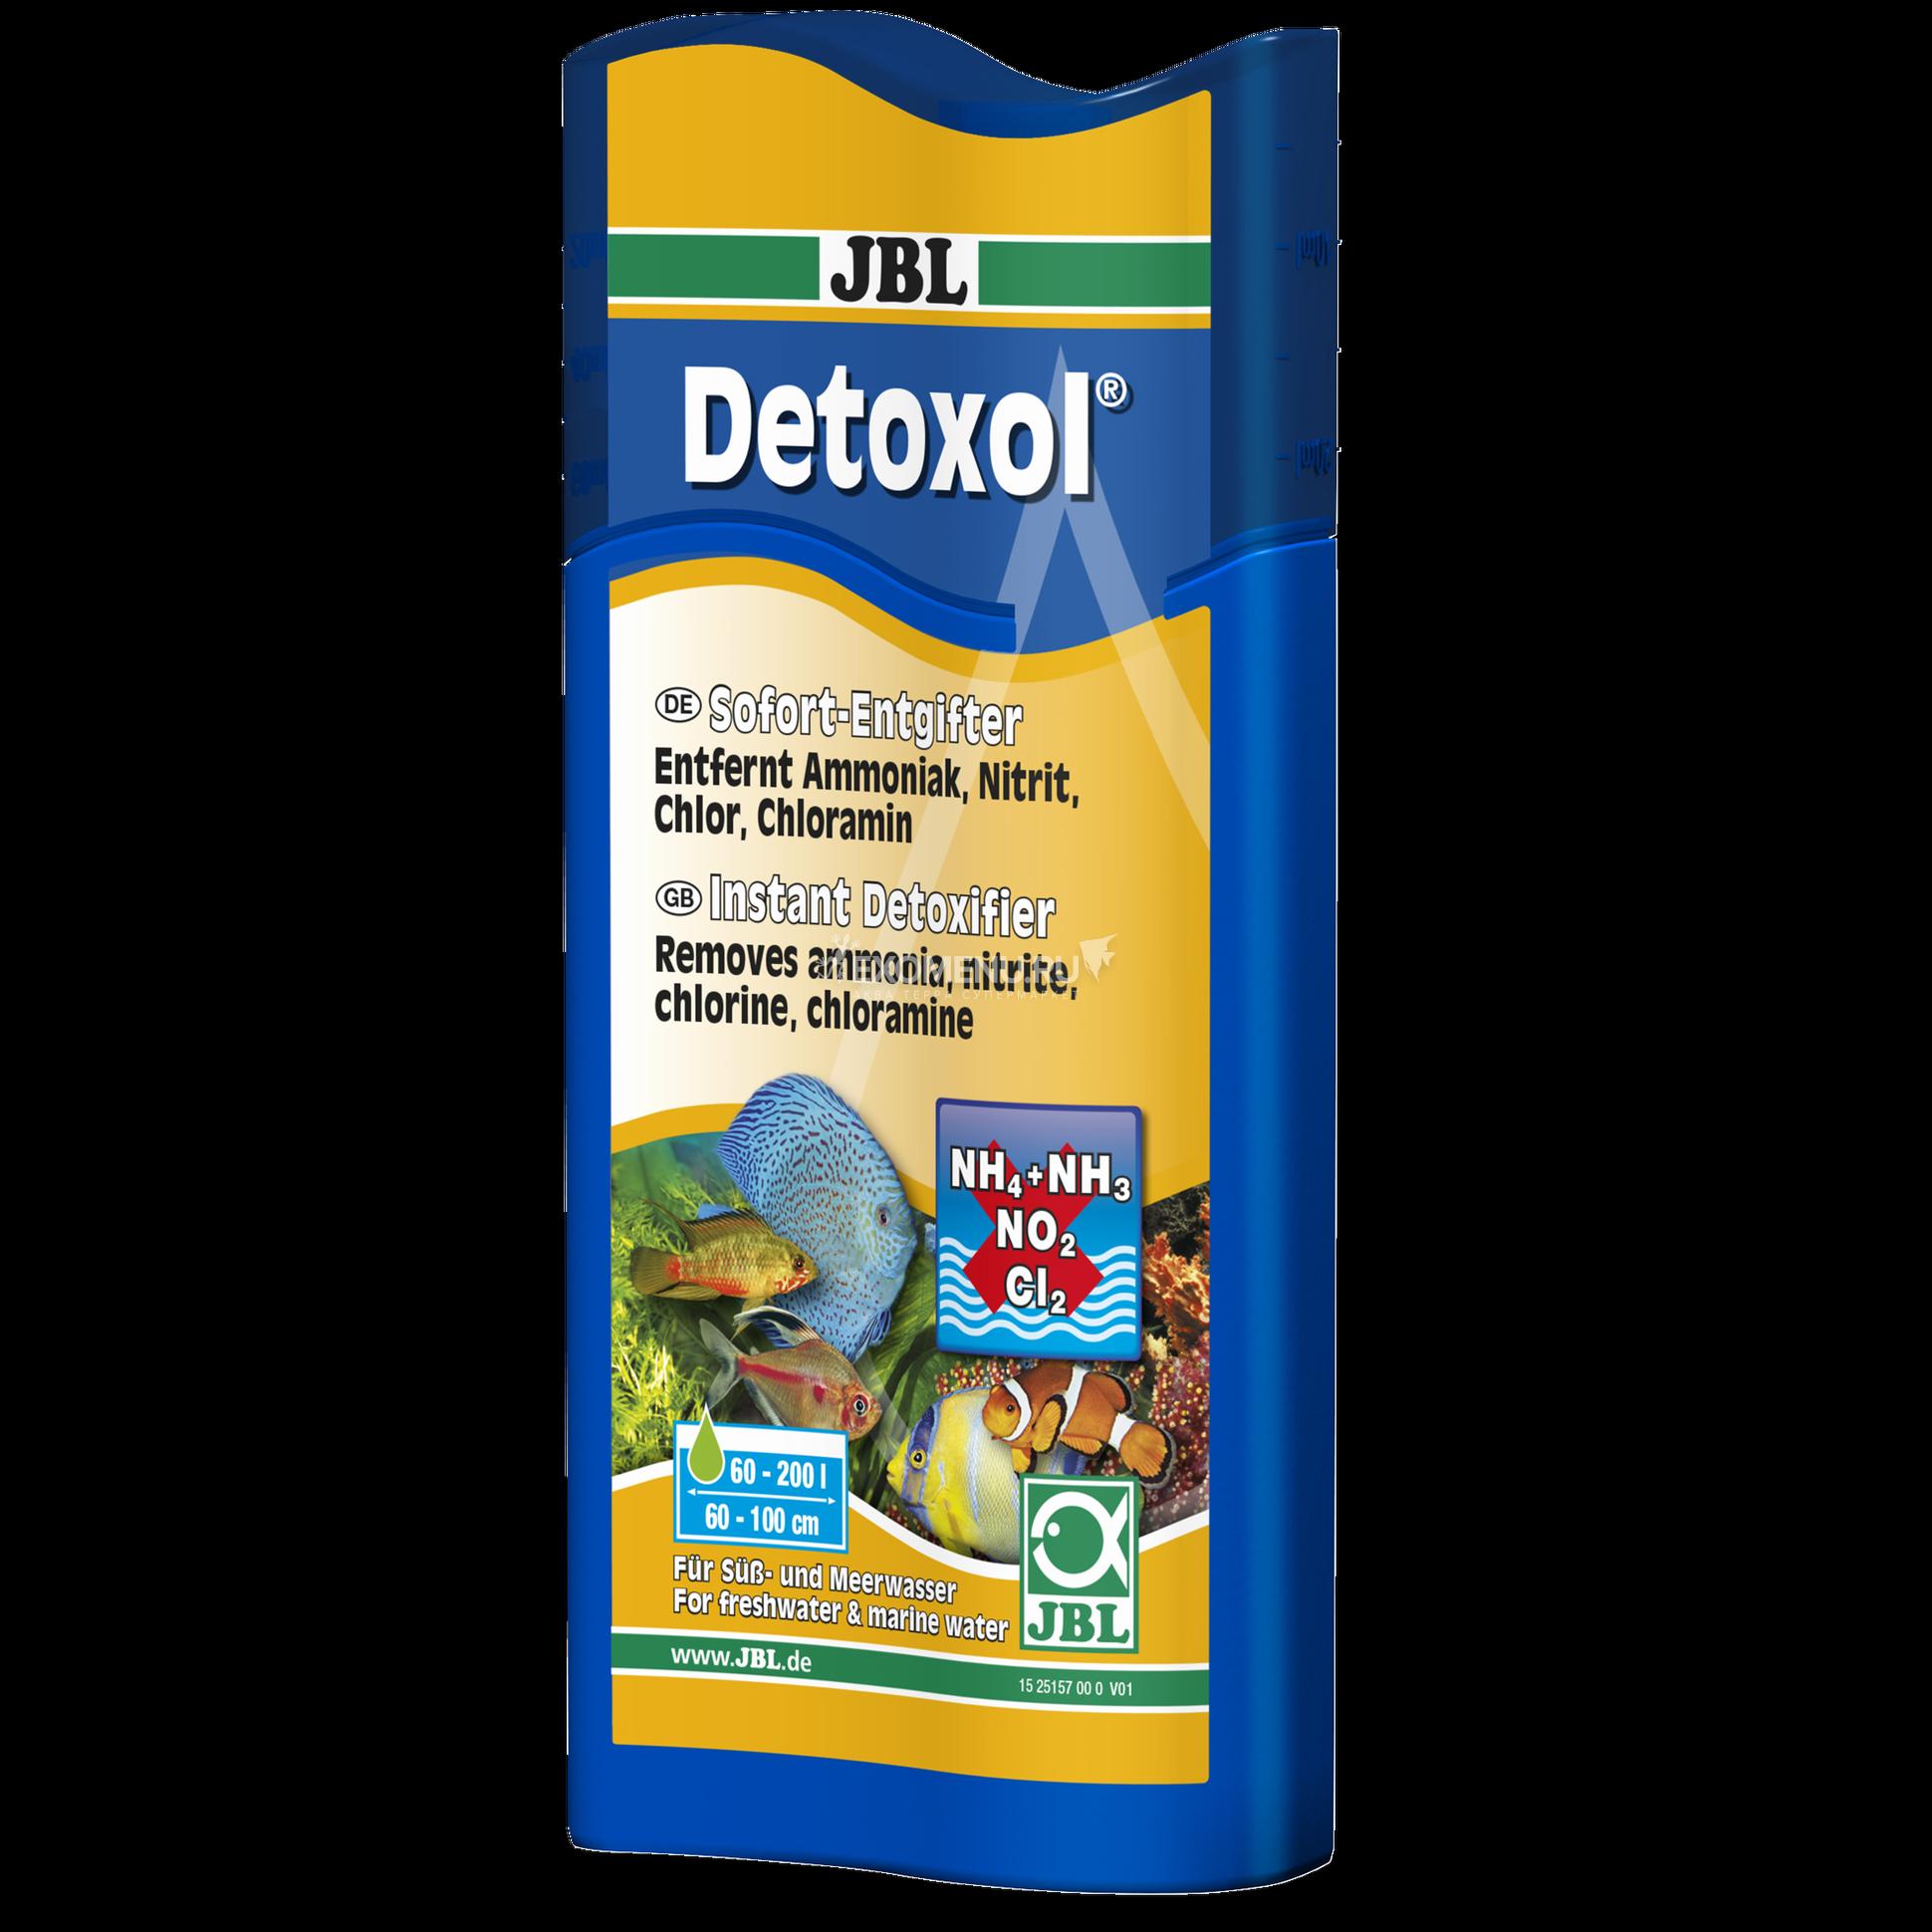 JBL Detoxol - Препарат для быстрой нейтрализации токсинов в аквариумной воде, 250 мл, на 1000 л